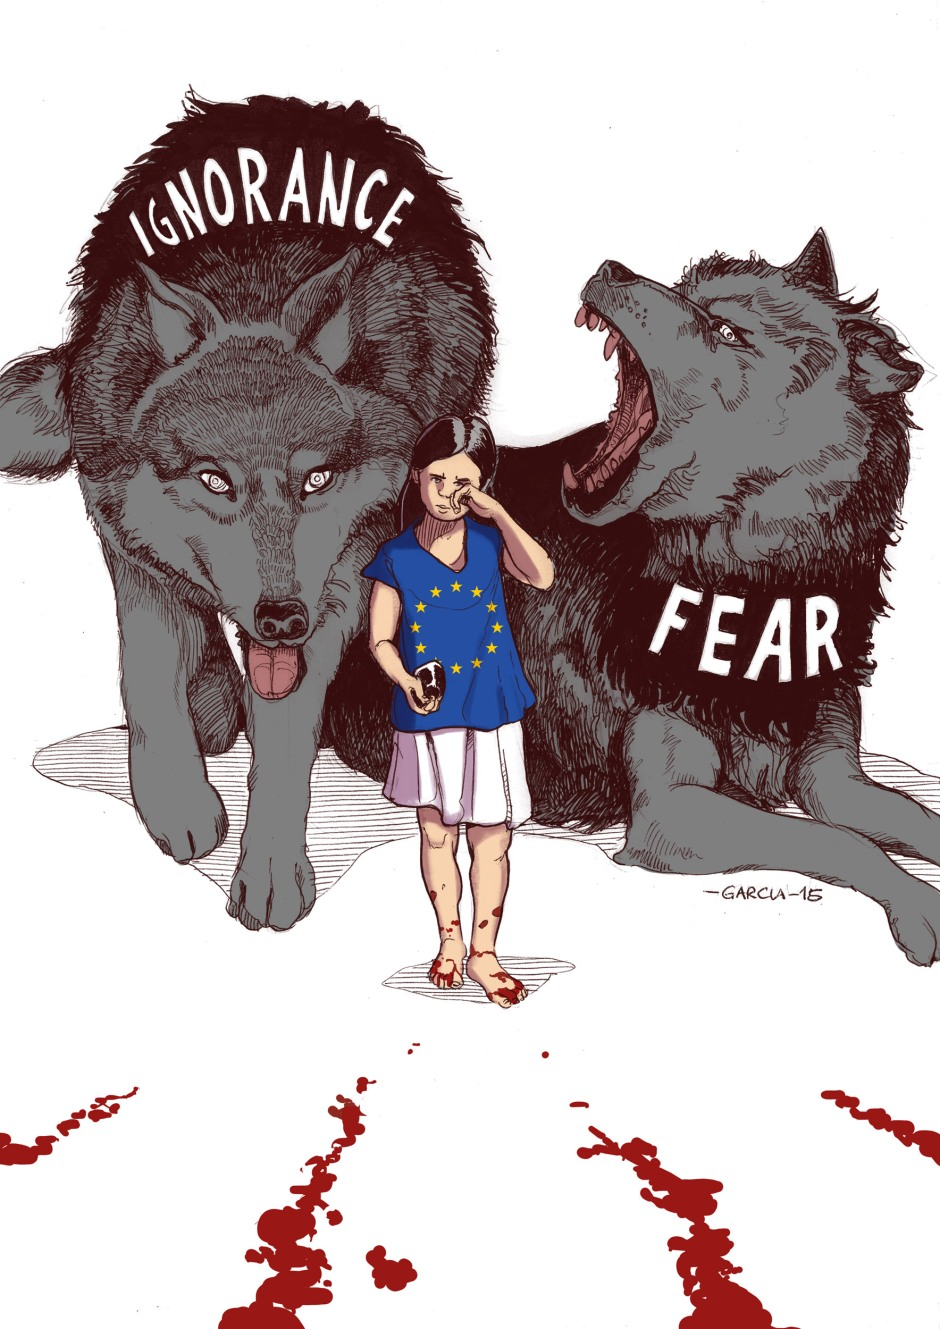 daniel-garcia-illustration-ignorance-fear-paris-syria-plaestine-africa-terrorrism-bombings-innocents